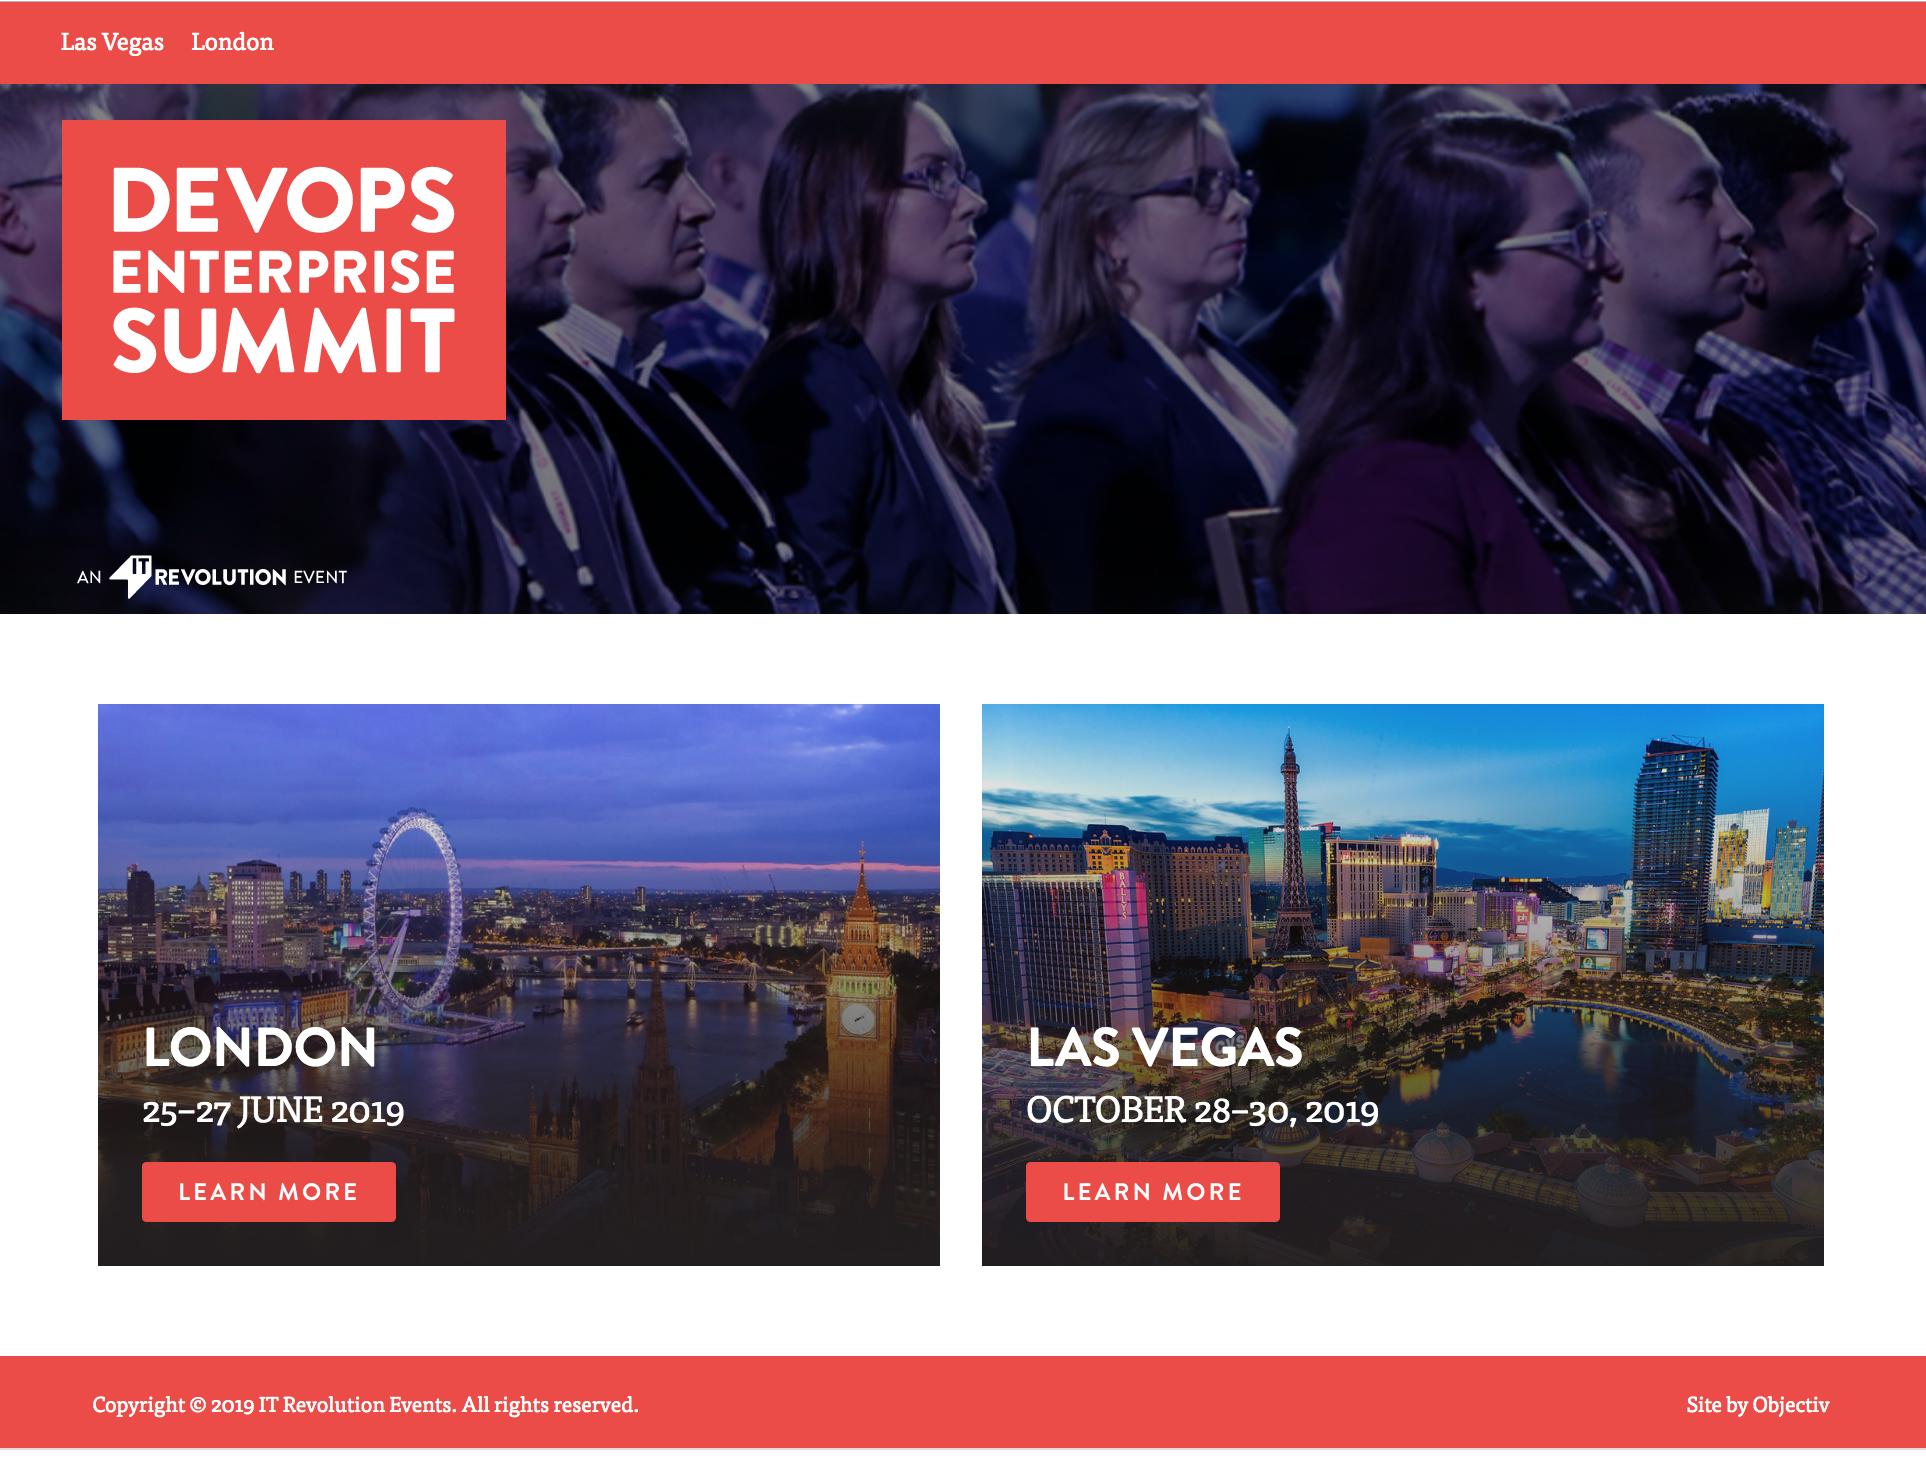 DevOps Enterprise Summit - Conference website and app content strategy